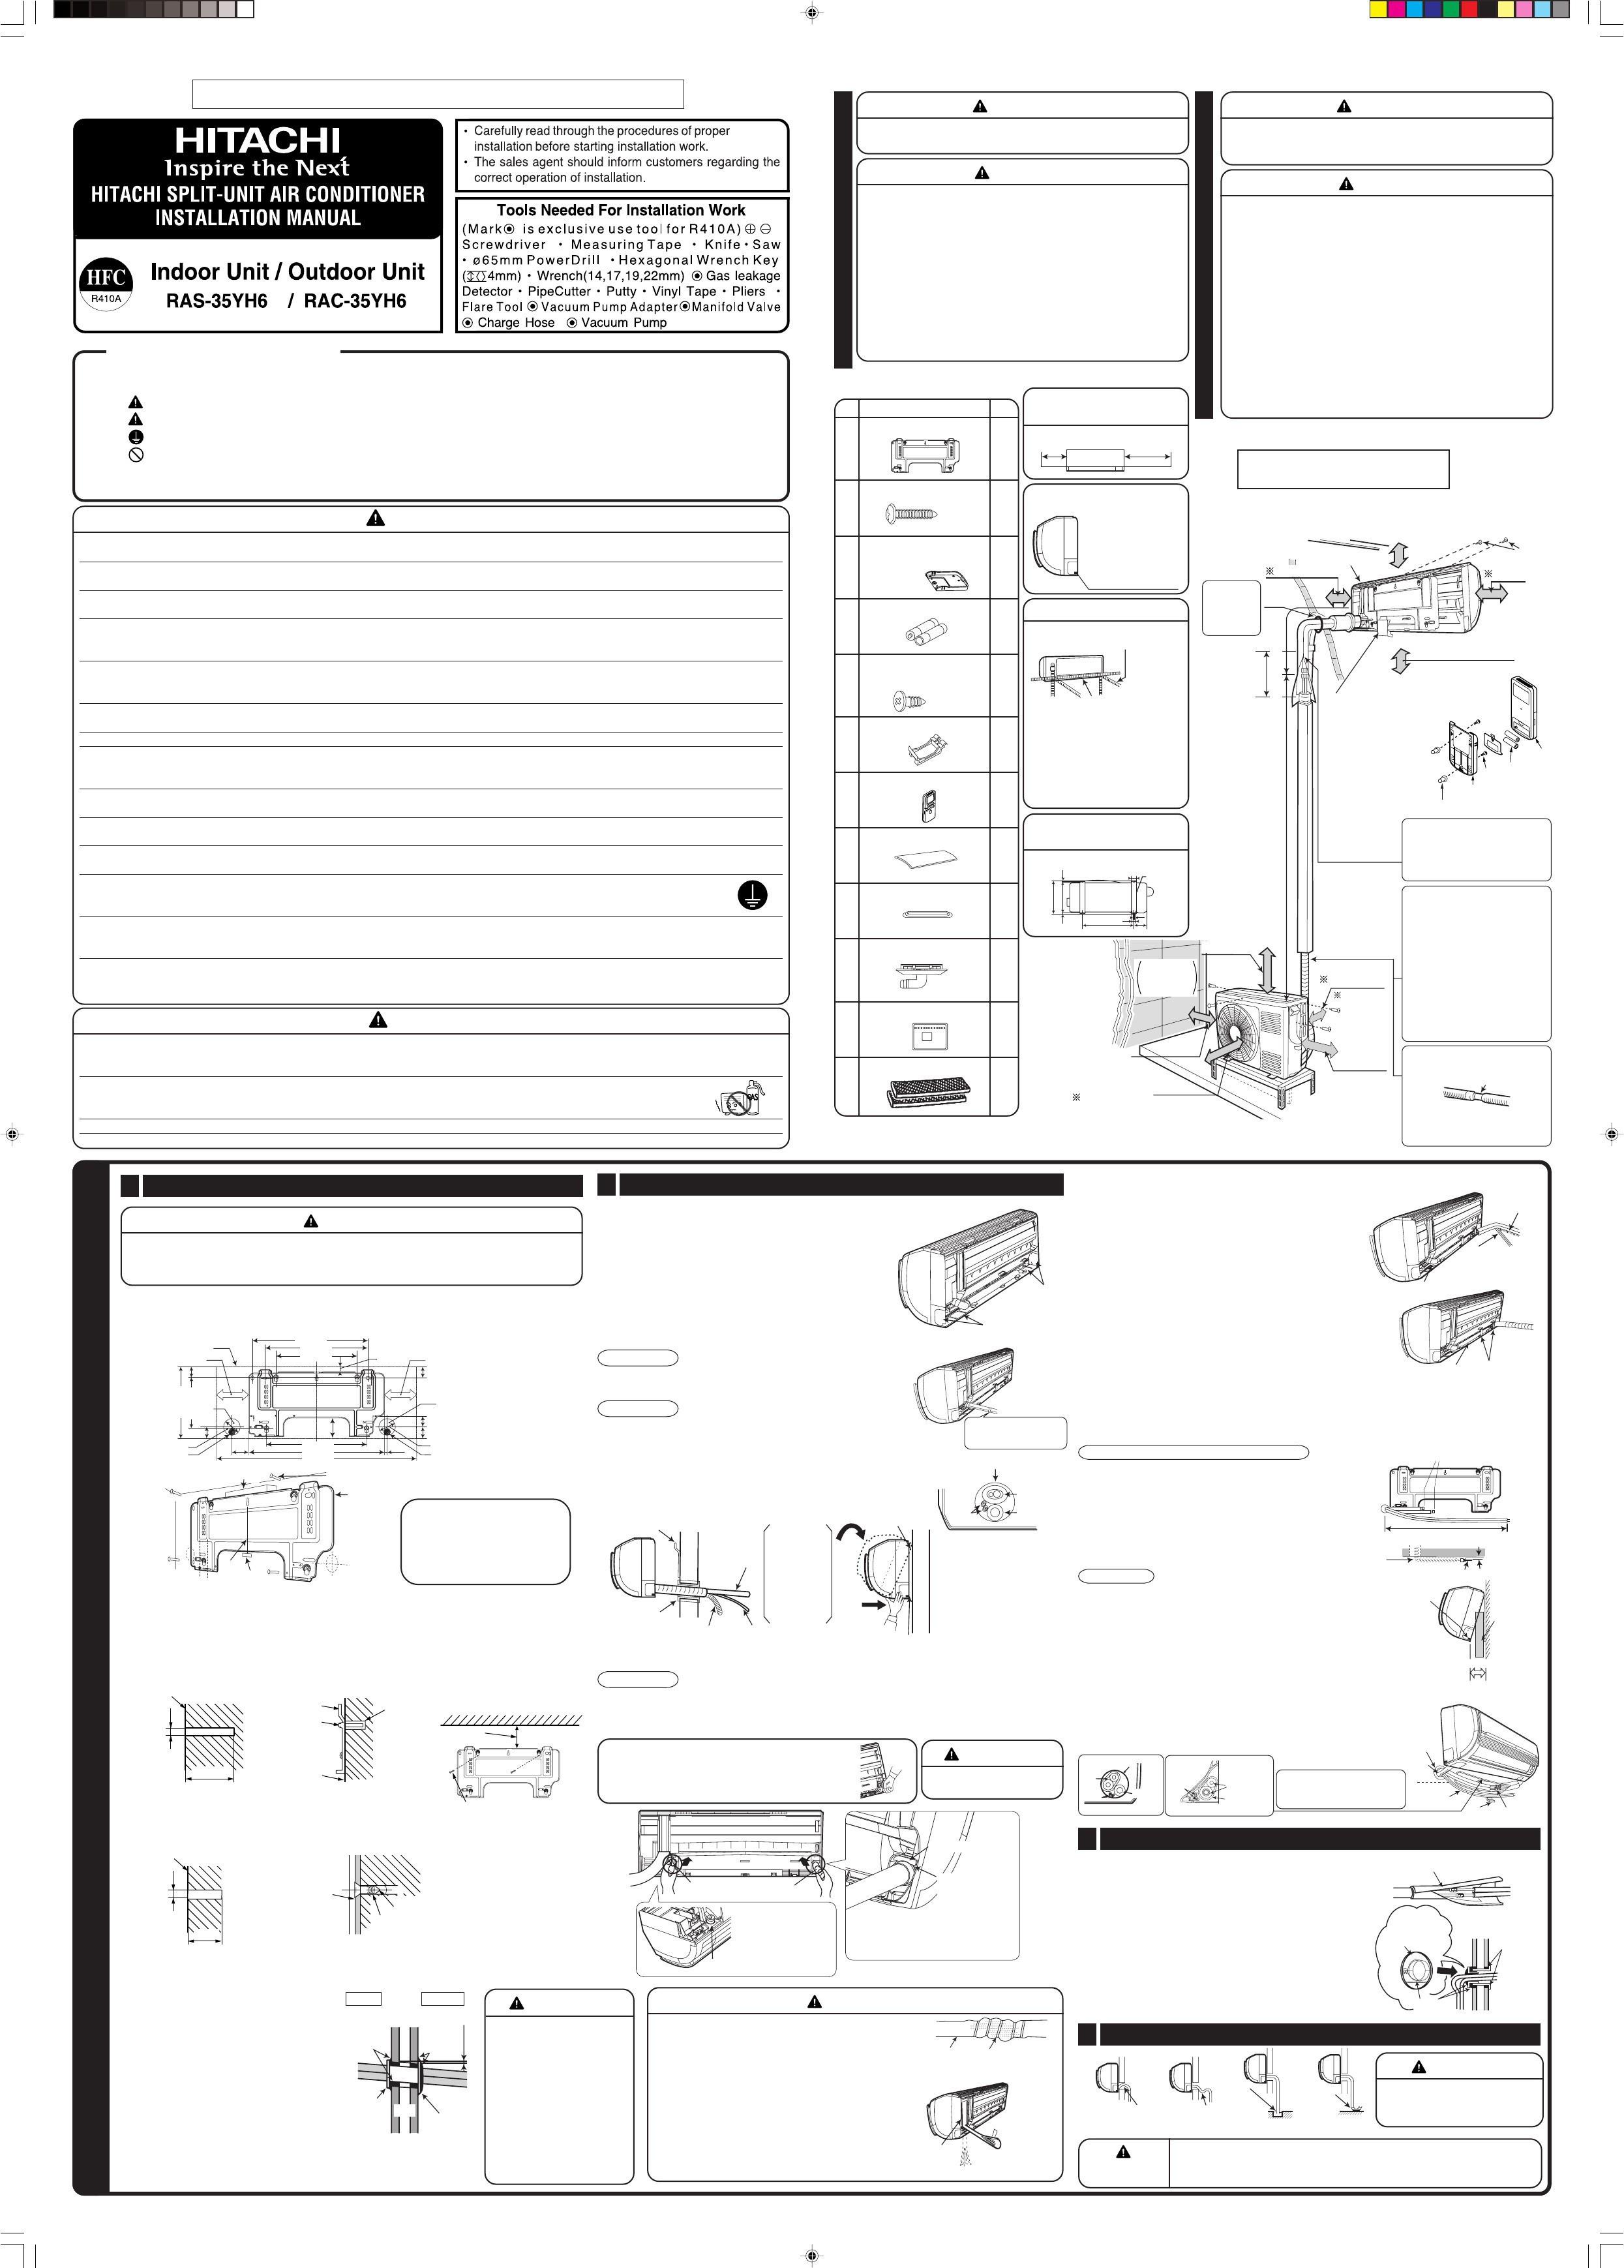 Ruud Ac Wiring Diagram Save Wiring Diagram Ac Central New Elegant Air Conditioner Wiring Diagram